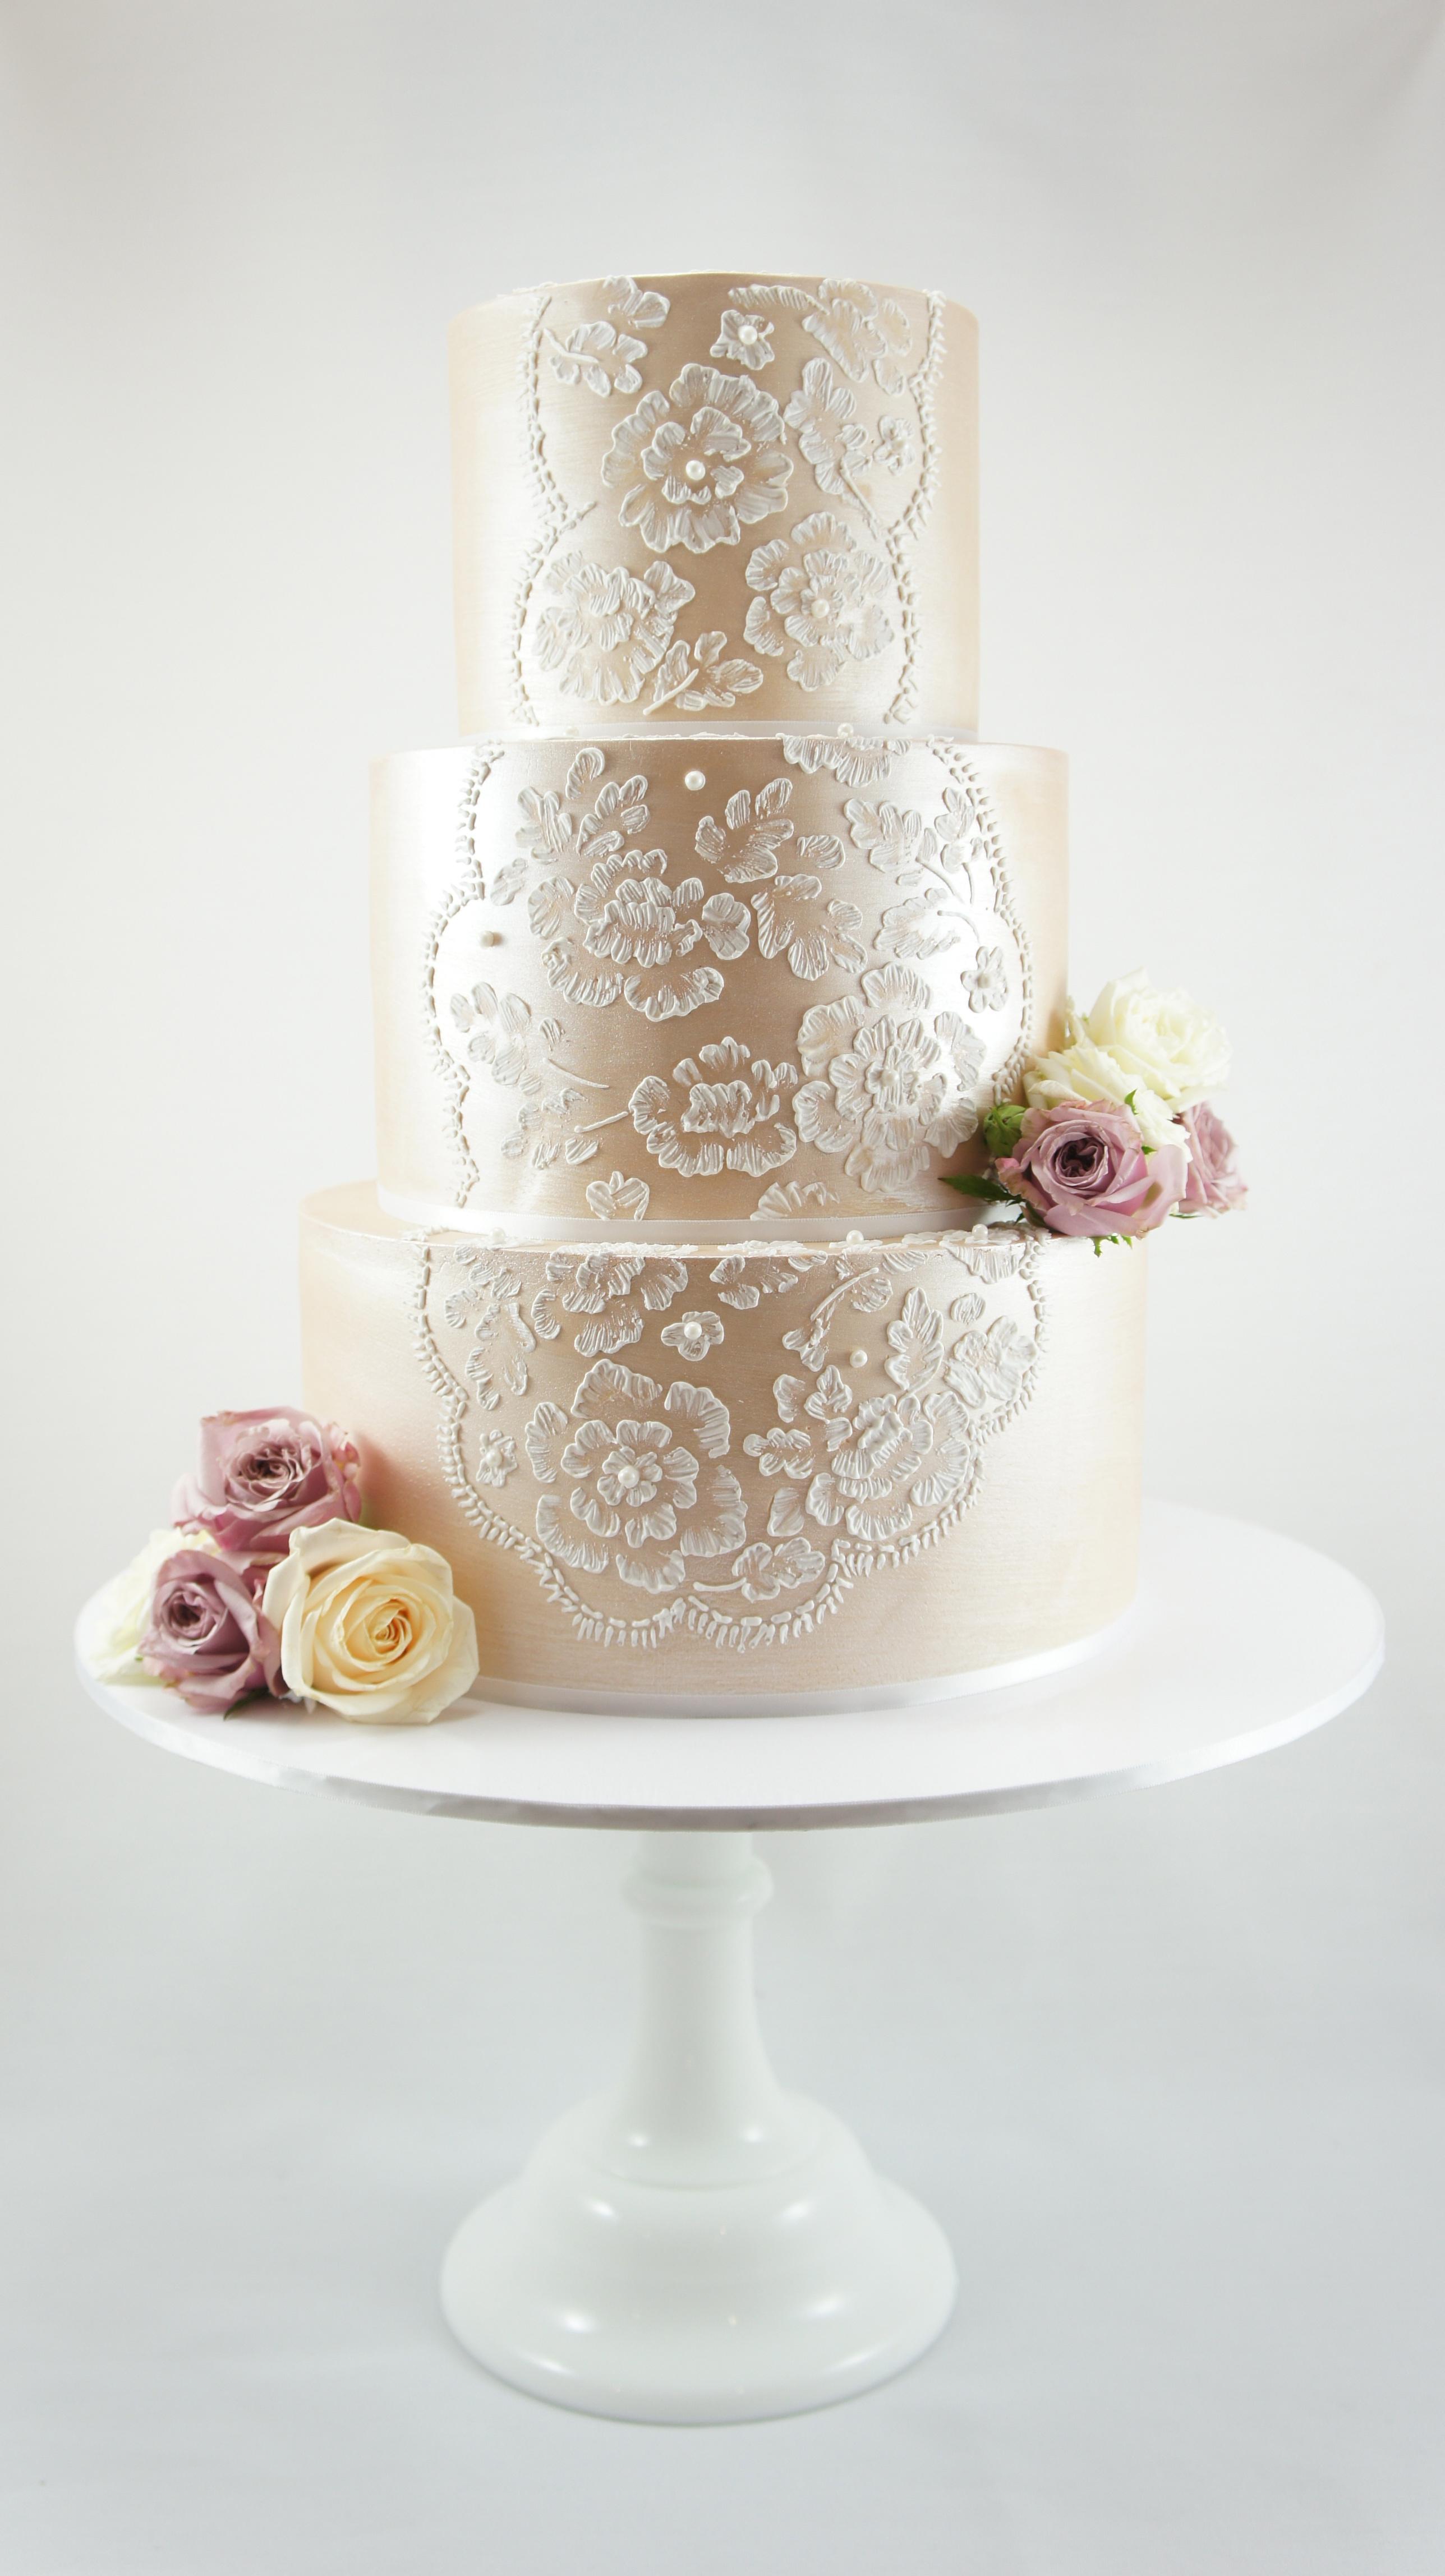 cakes-2-cupcakes-fresh-flowers.jpg